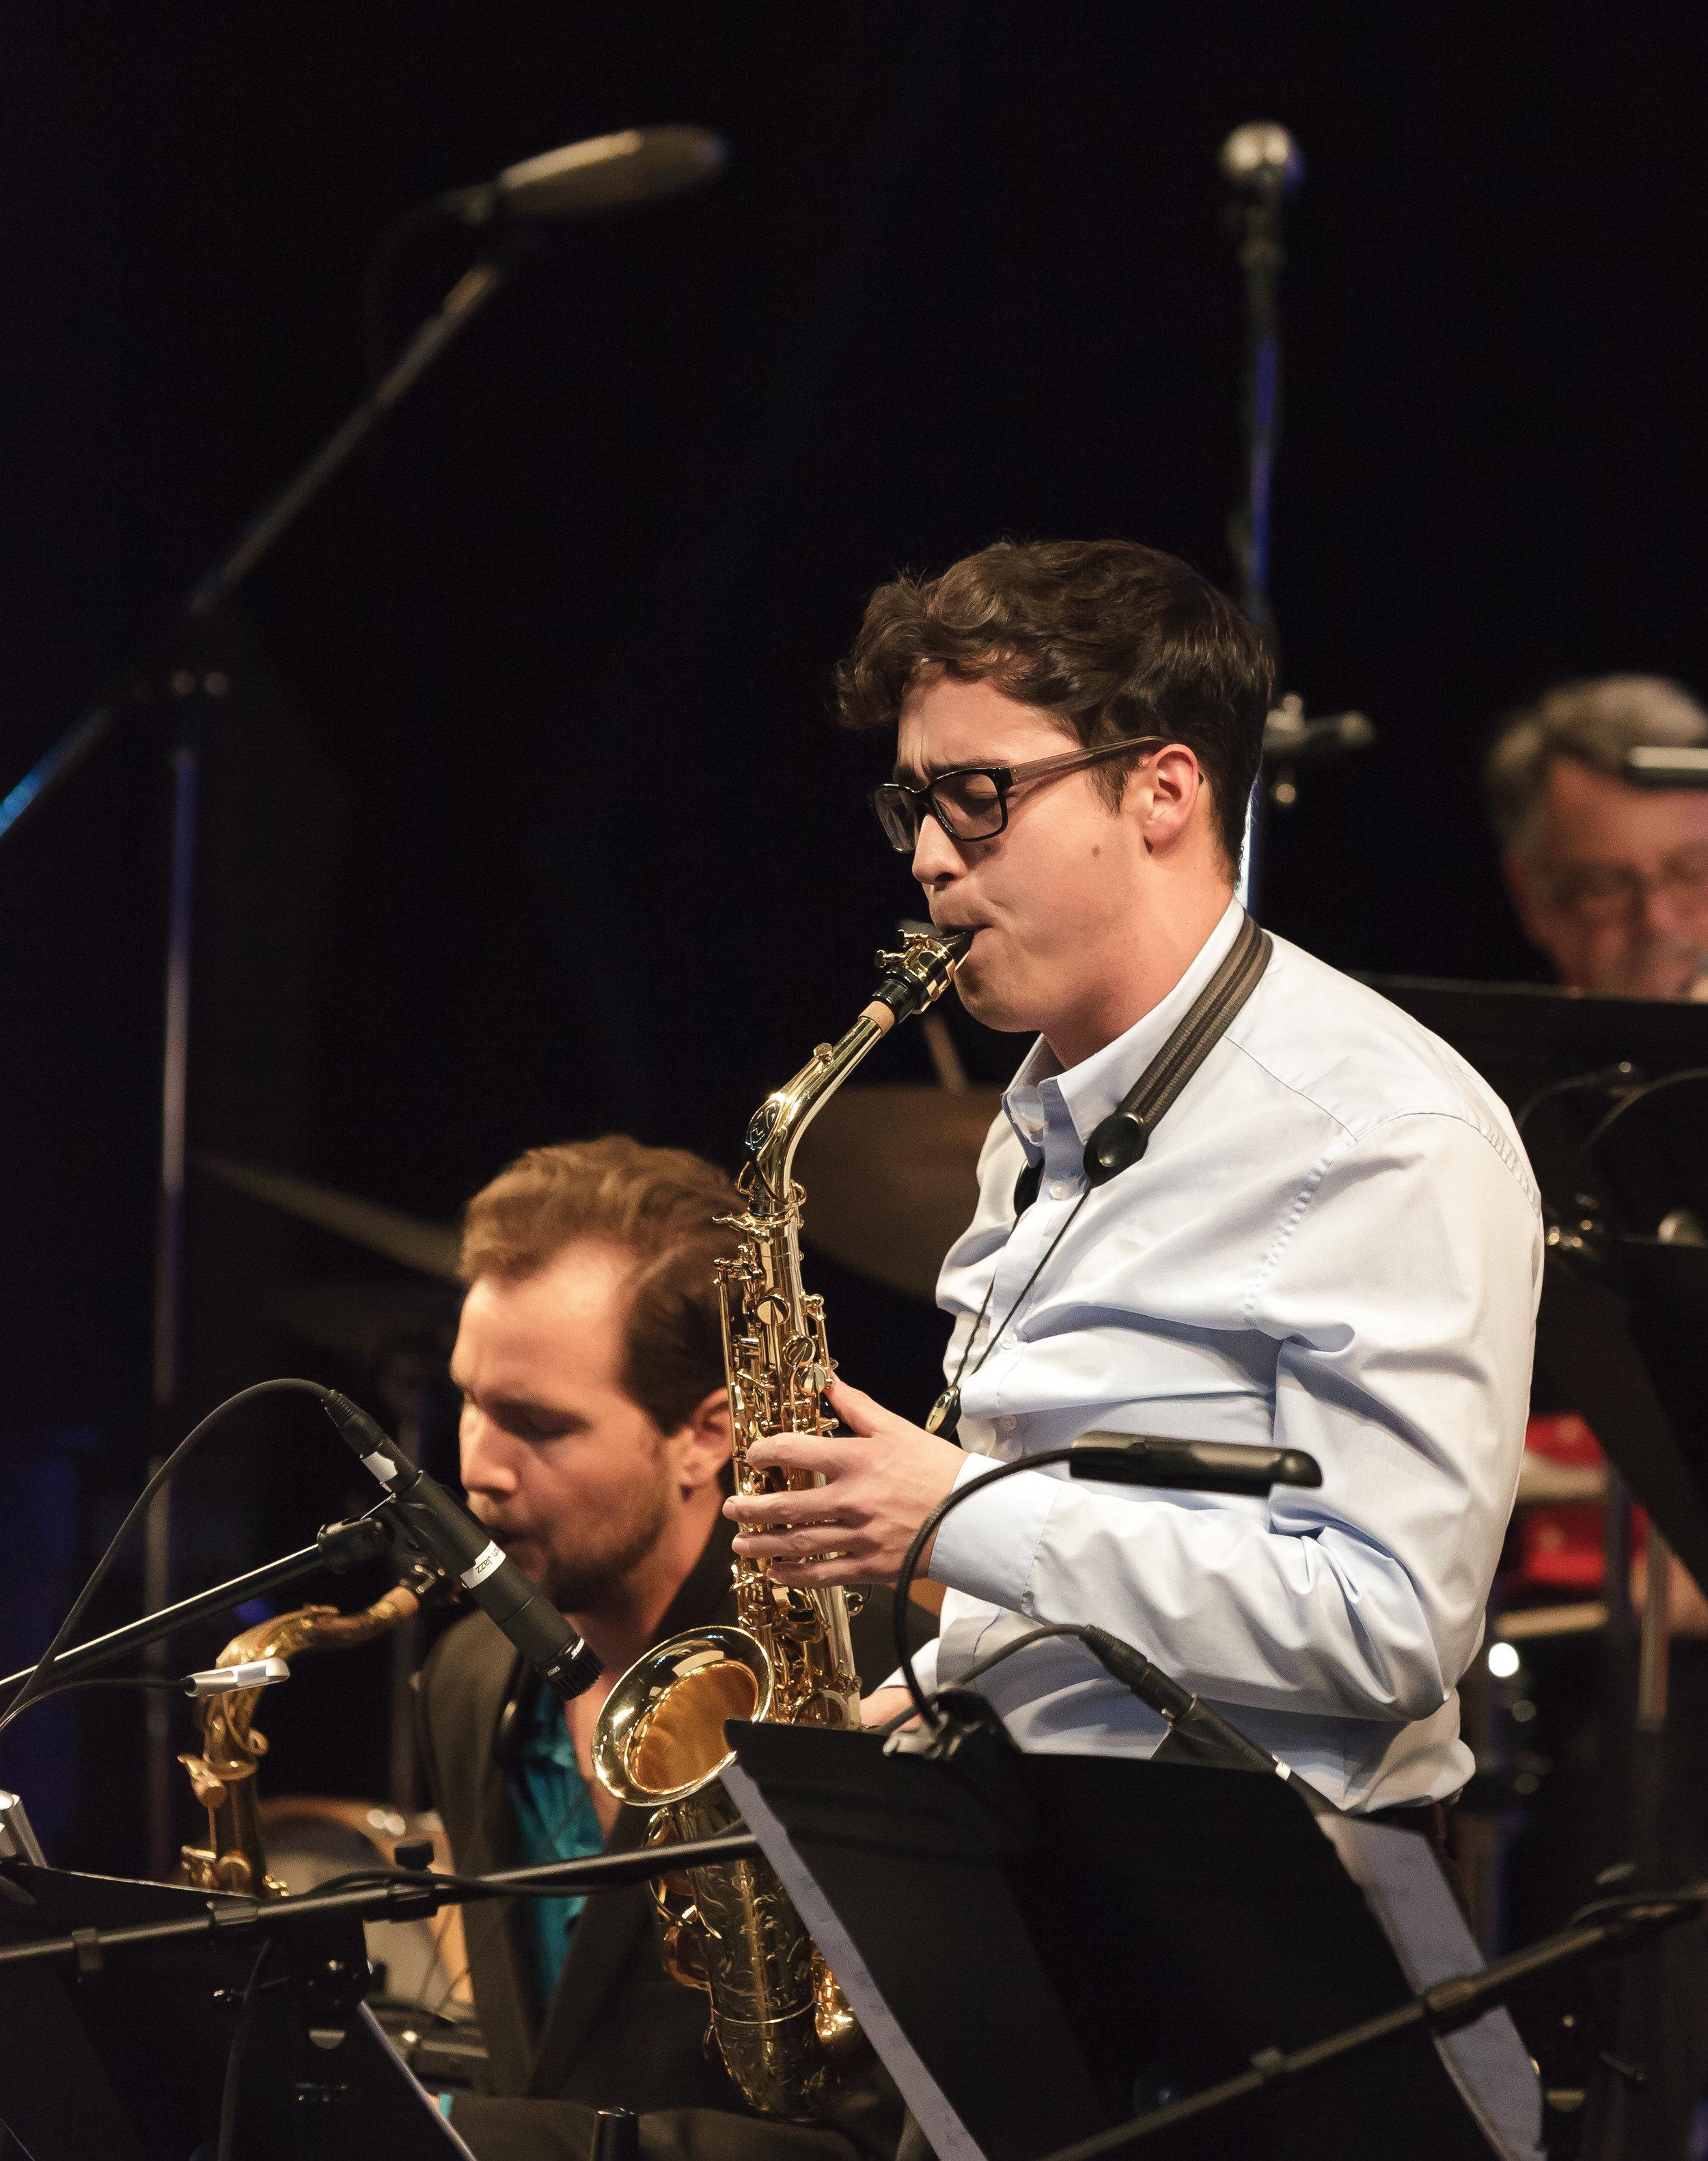 Tomo Downs, alto sax